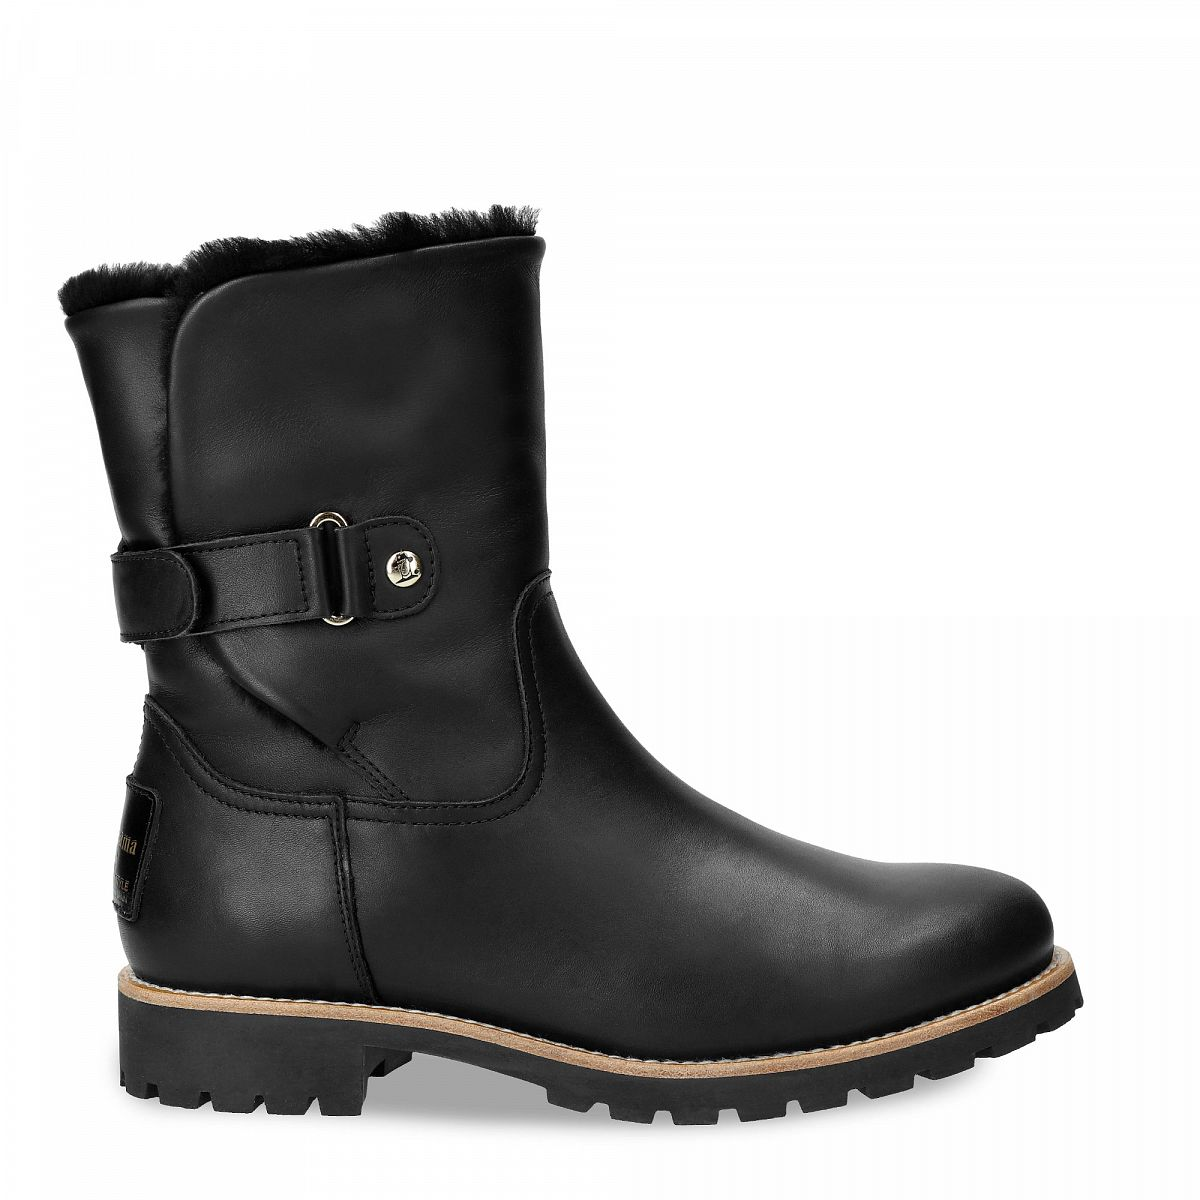 88ee2eb37a4 Women s boot FELIA IGLOO TRAVELLING black